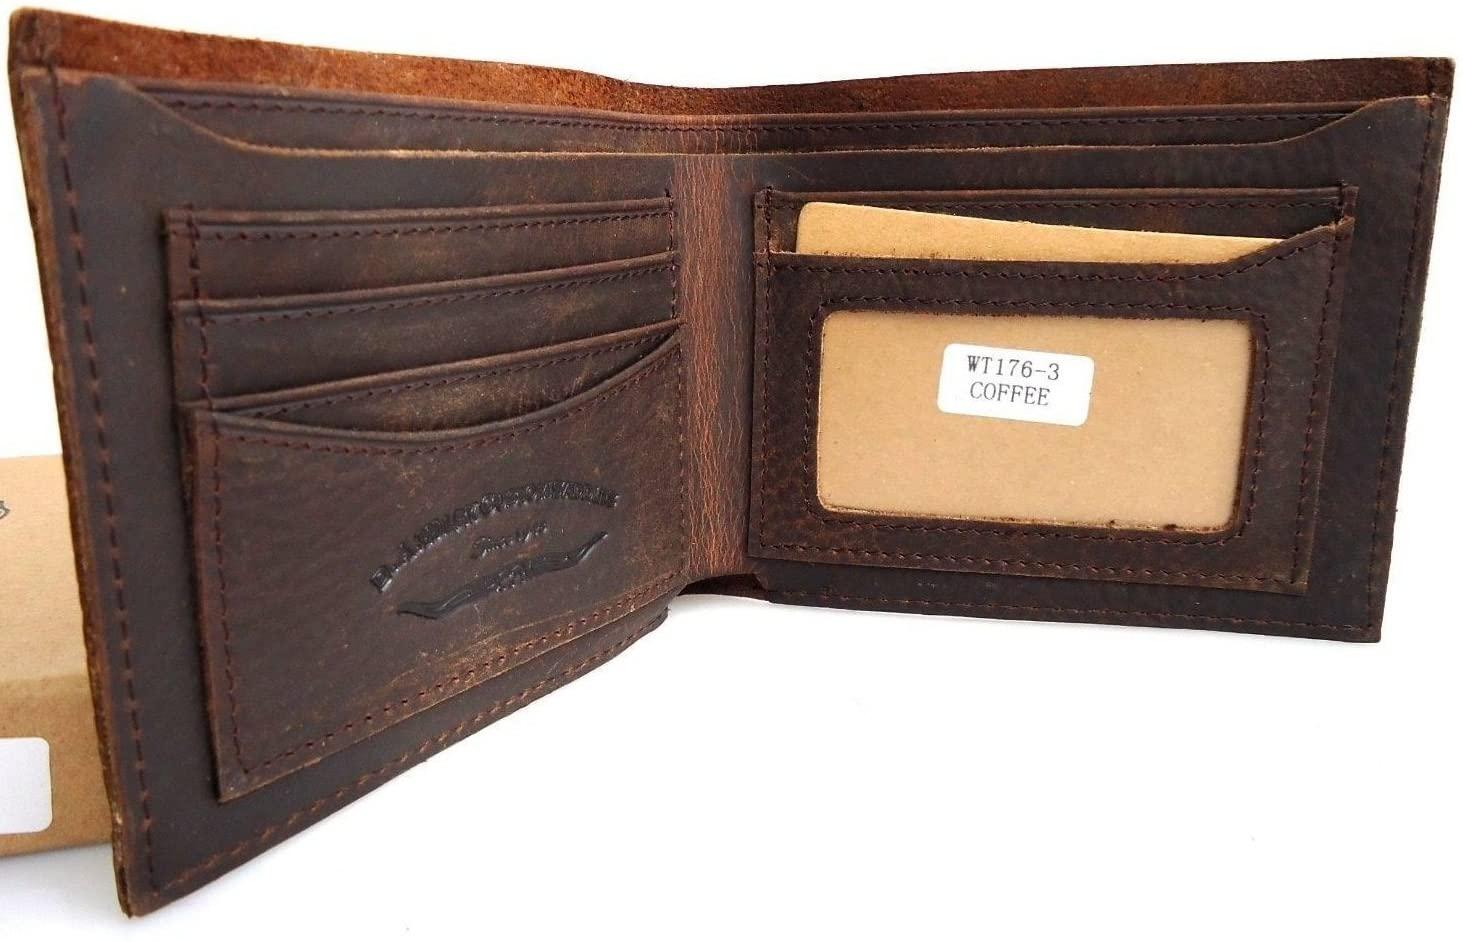 Men Money Genuine Leather Wallet Skin Coin Skin Natural Pocket Purse Soft Retro Style Club thin brown